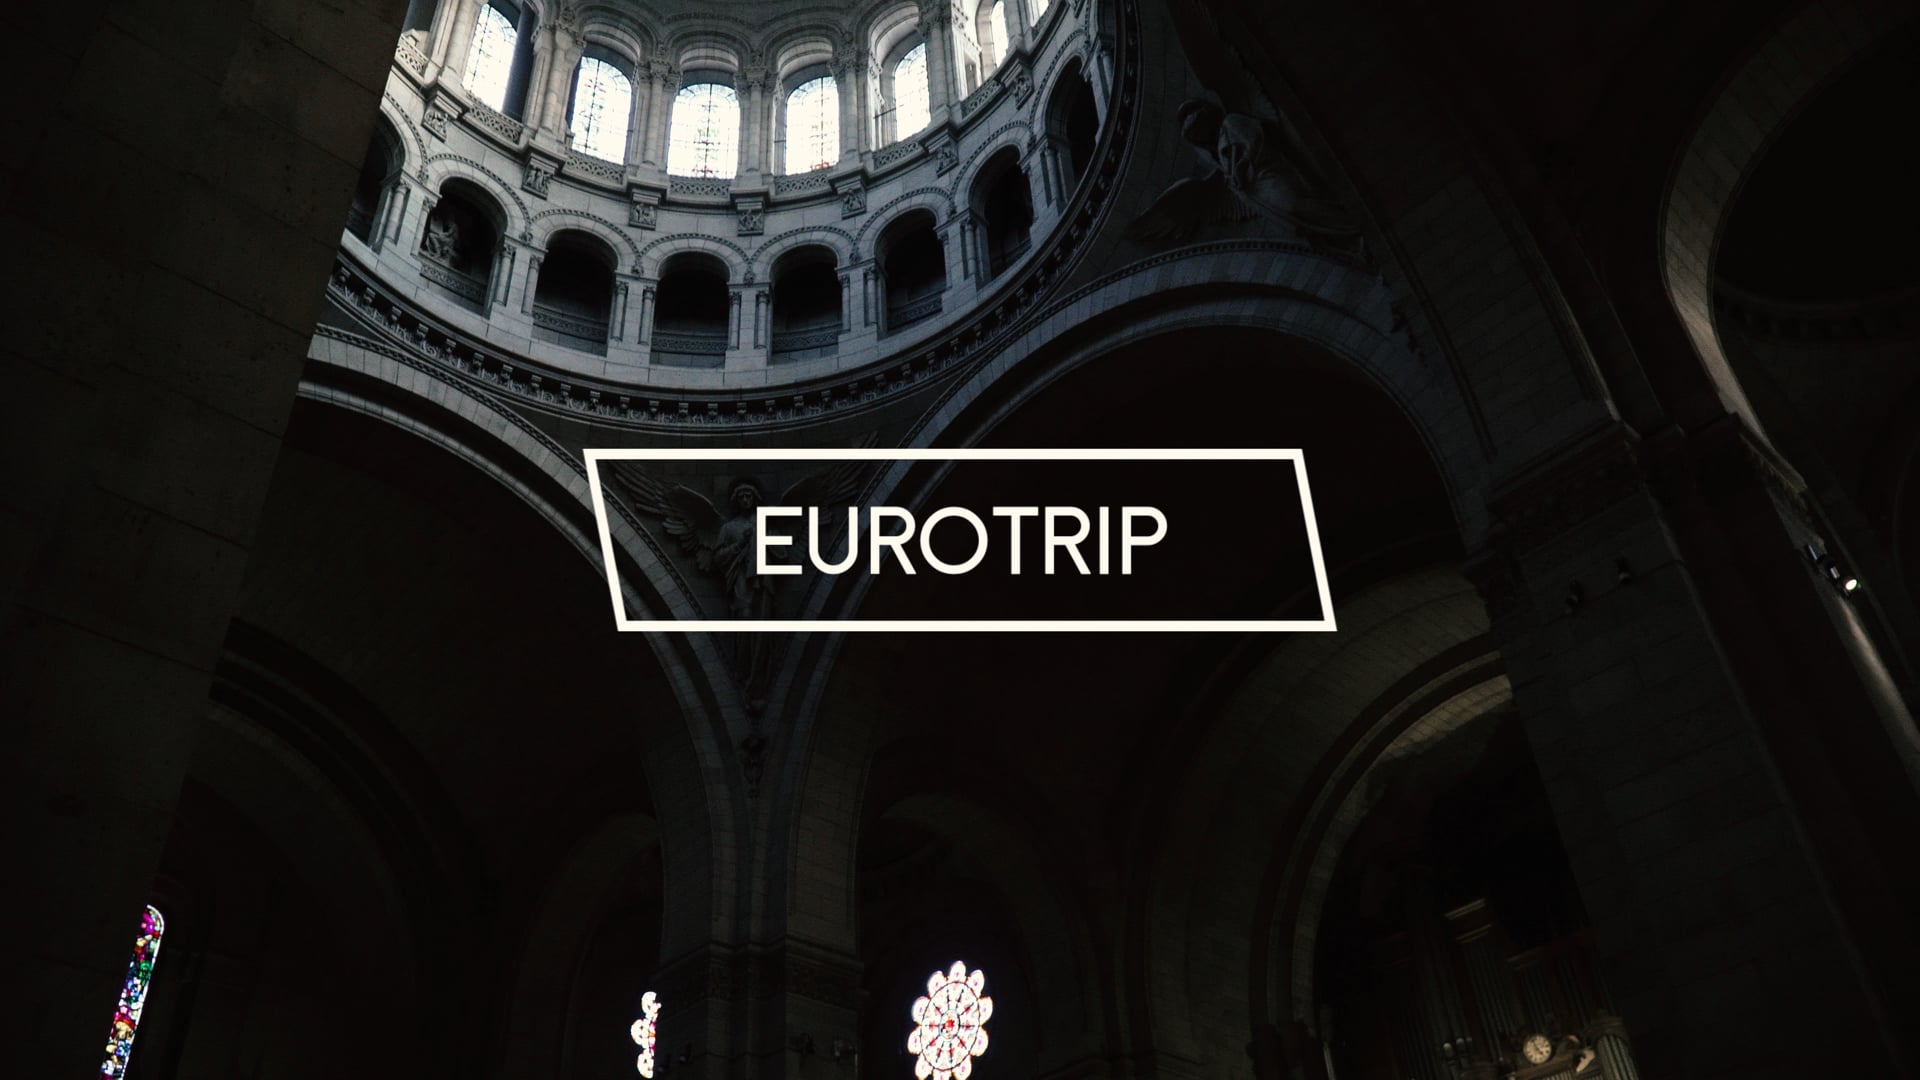 The EUROTRIP